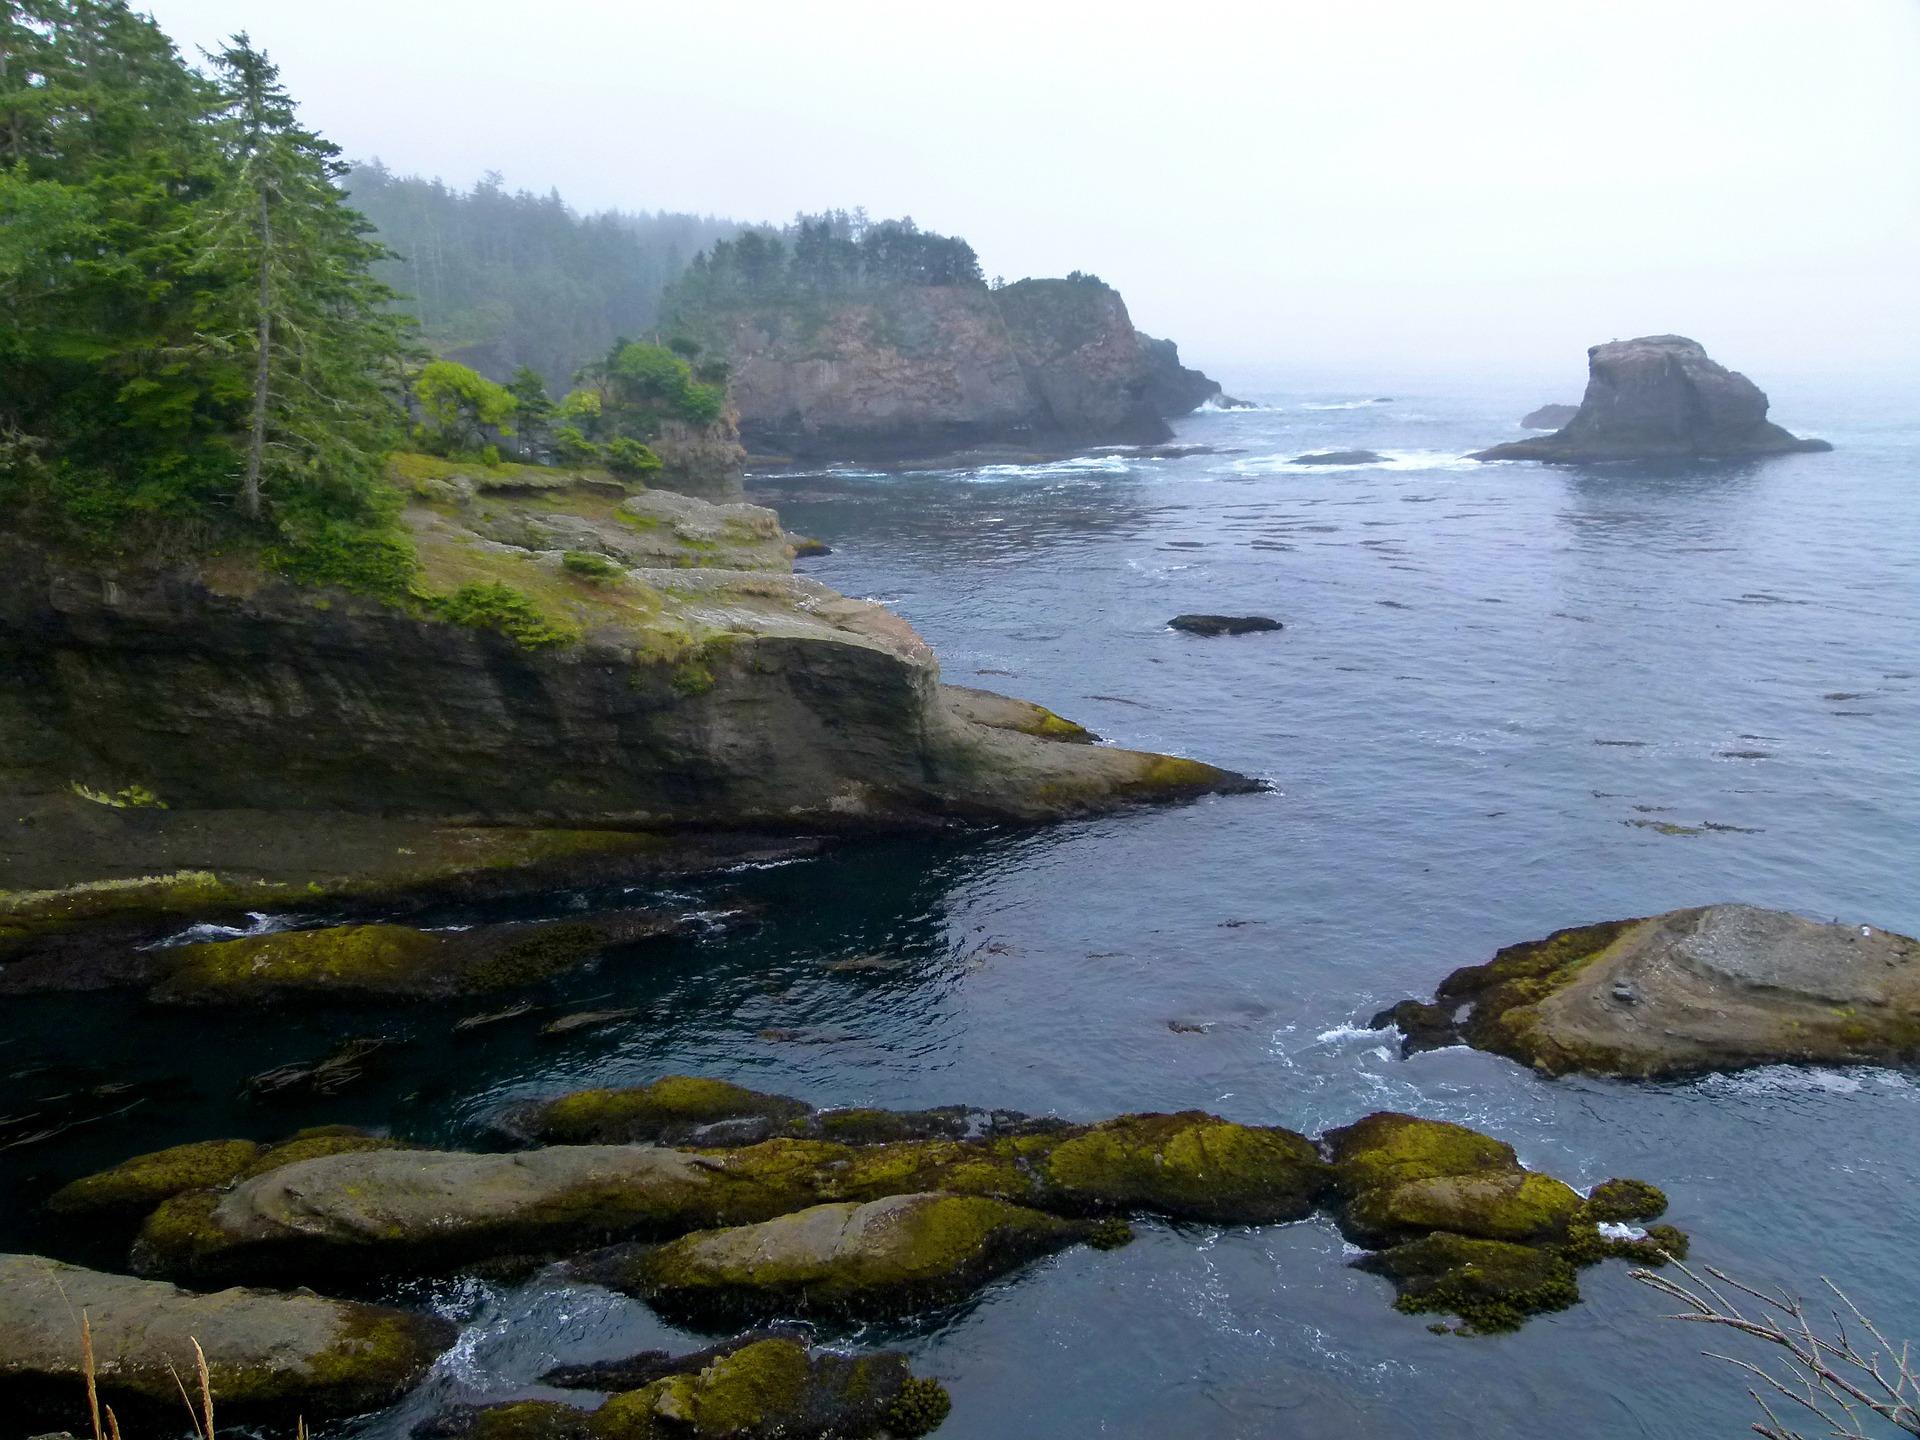 Cape Flattery (Washington)